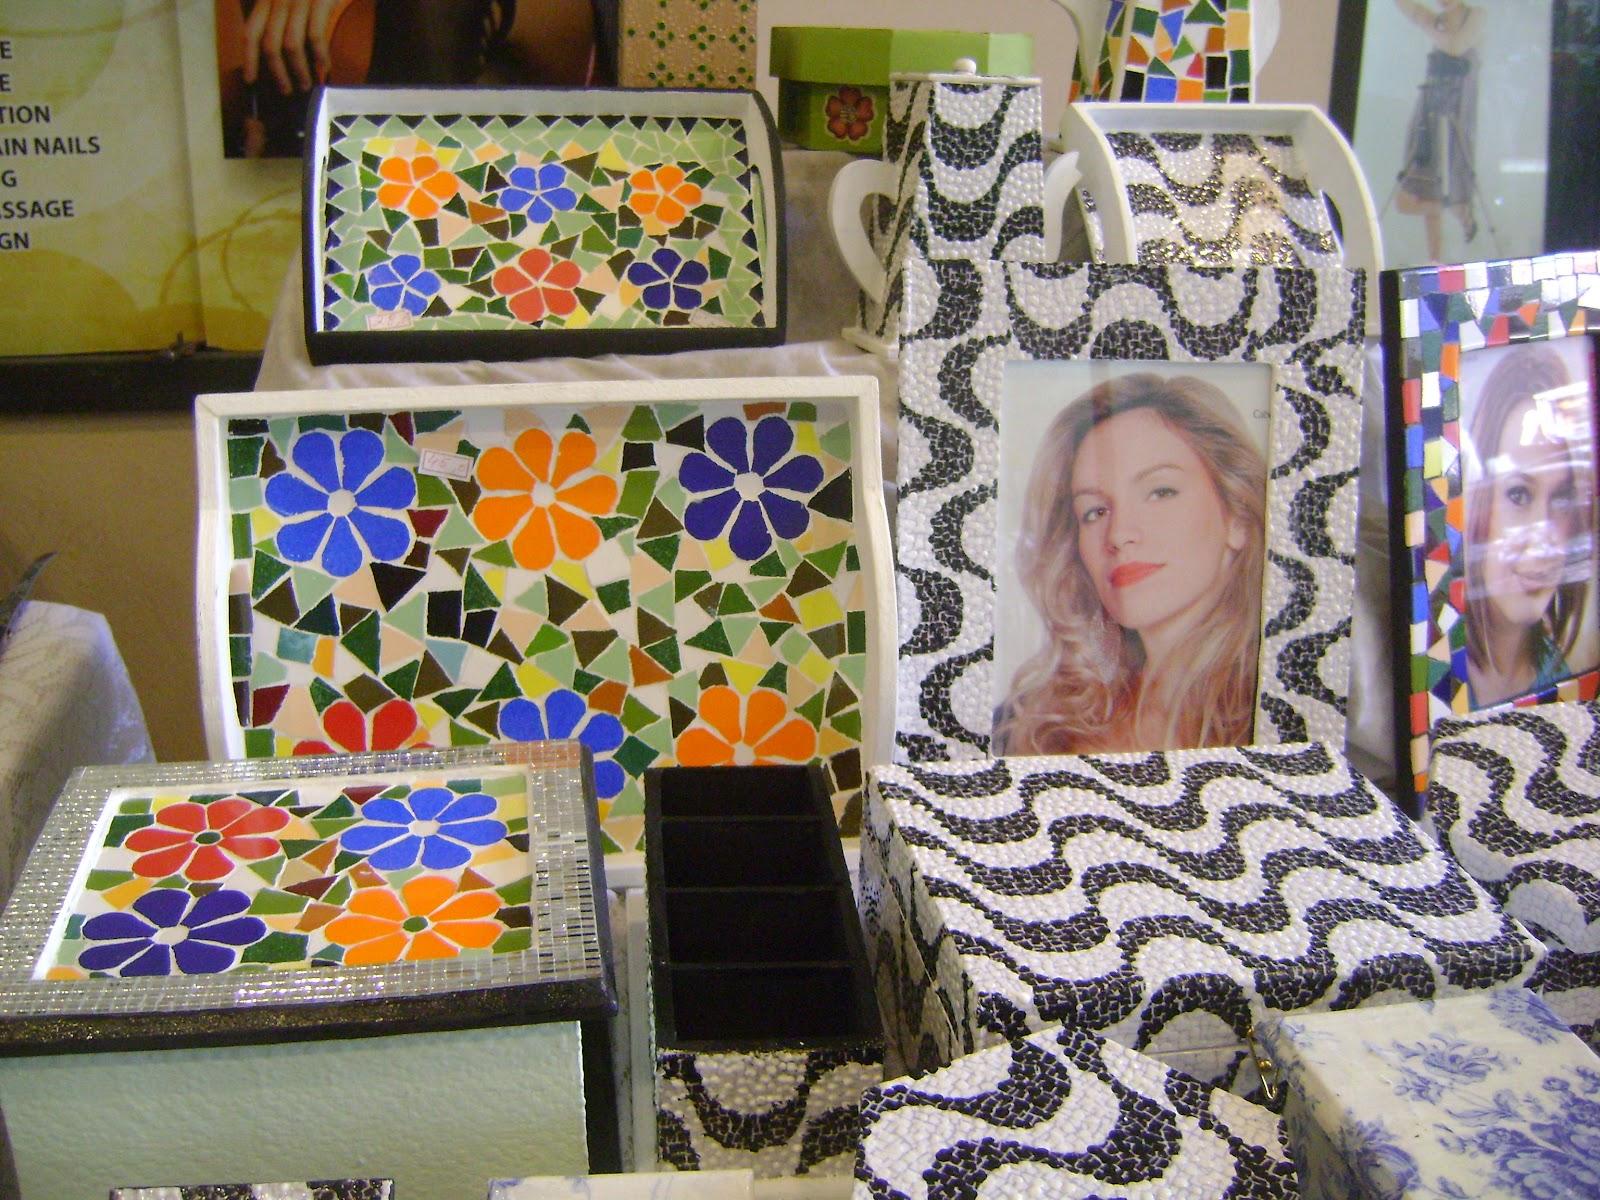 Aparador Con Kallax ~ Mosaicos Eliane Amorim Feira de Artesanato Av Nsa Sra de Copacabana n u00ba1133 Galeria Posto